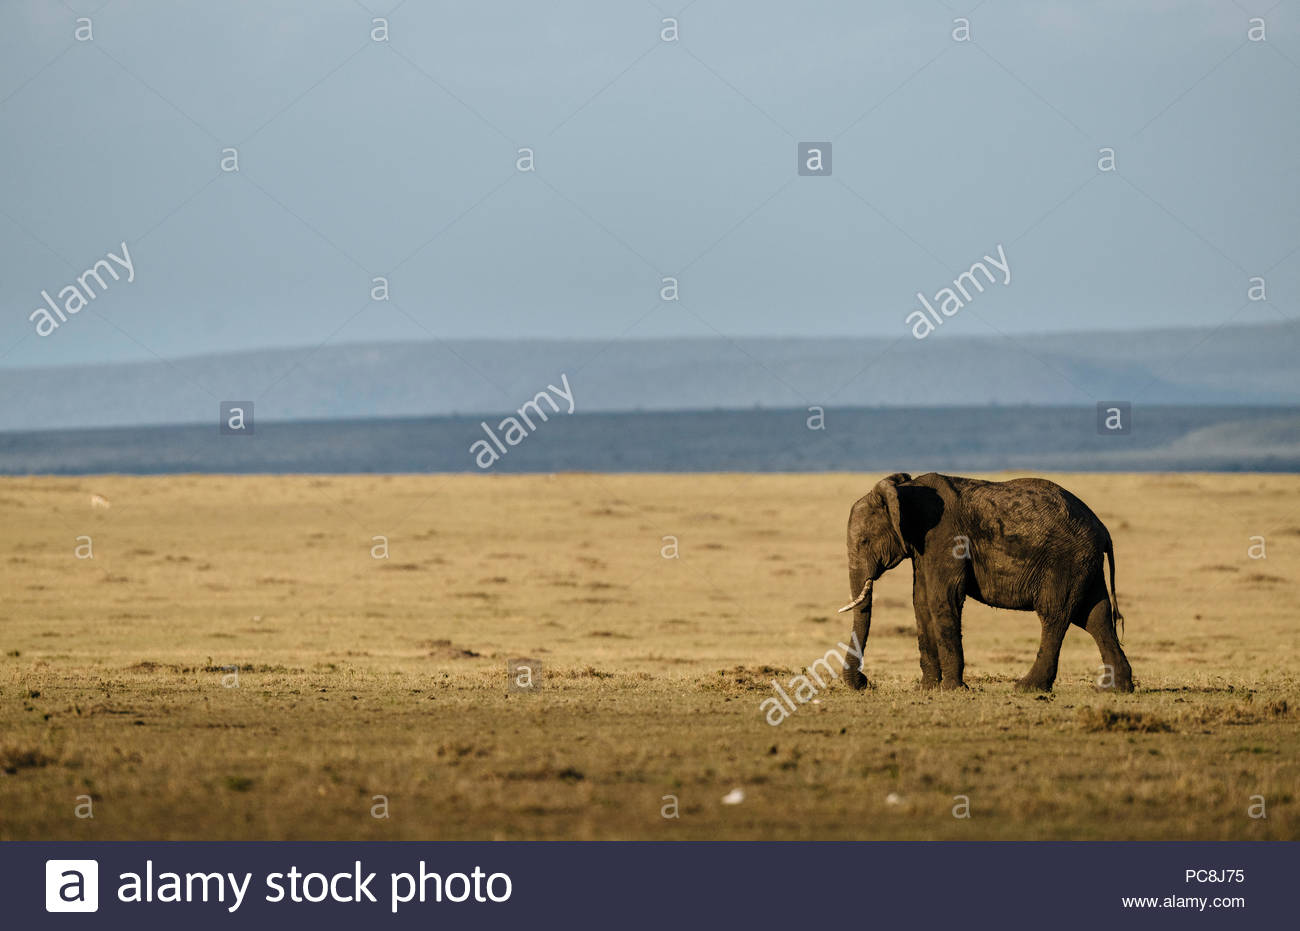 African elephant, Loxodonta africana, standing on savanna. - Stock Image